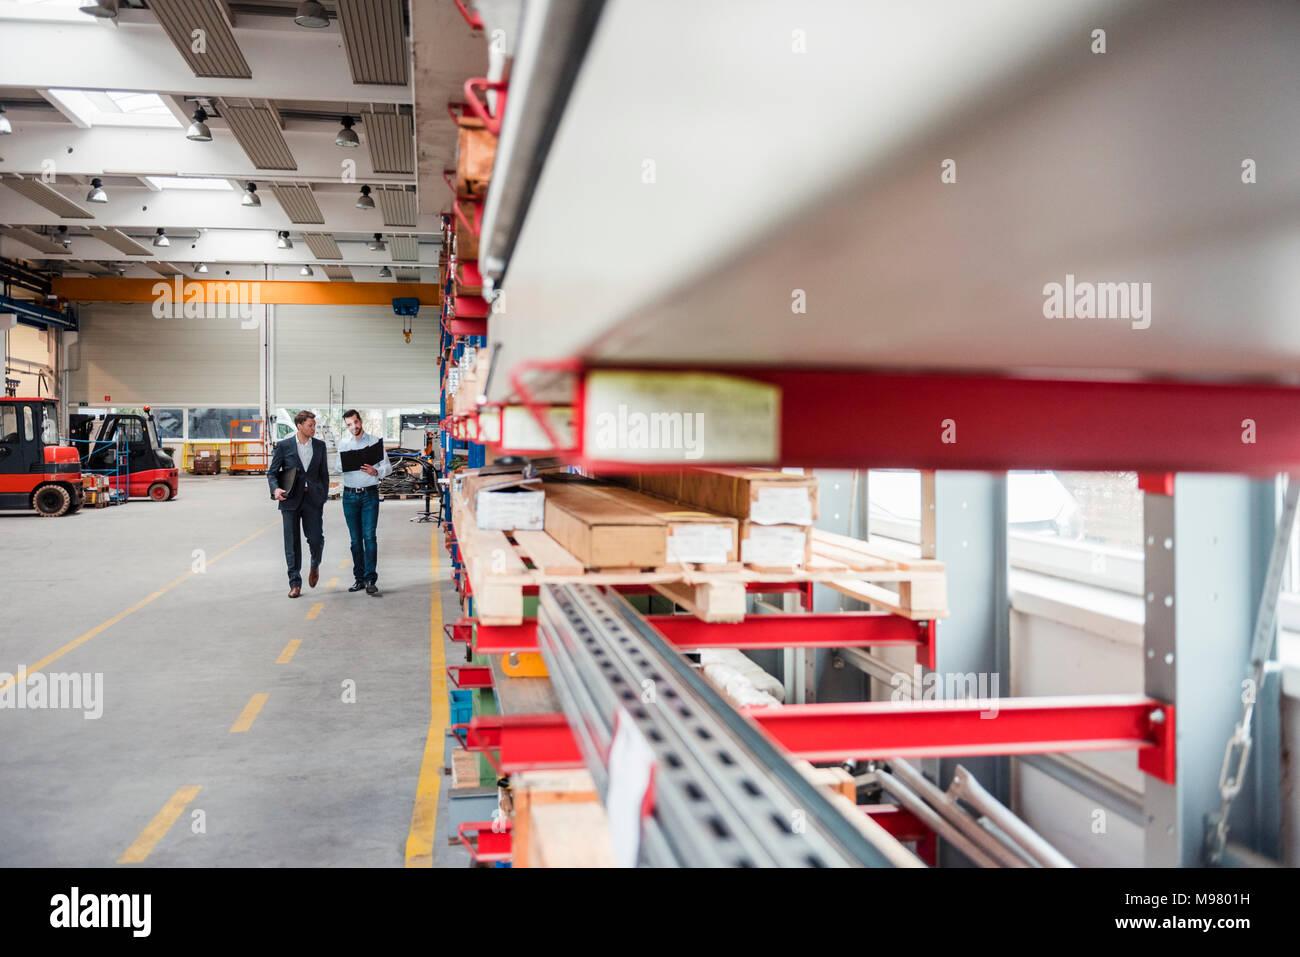 Two men walking and talking in factory shop floor - Stock Image